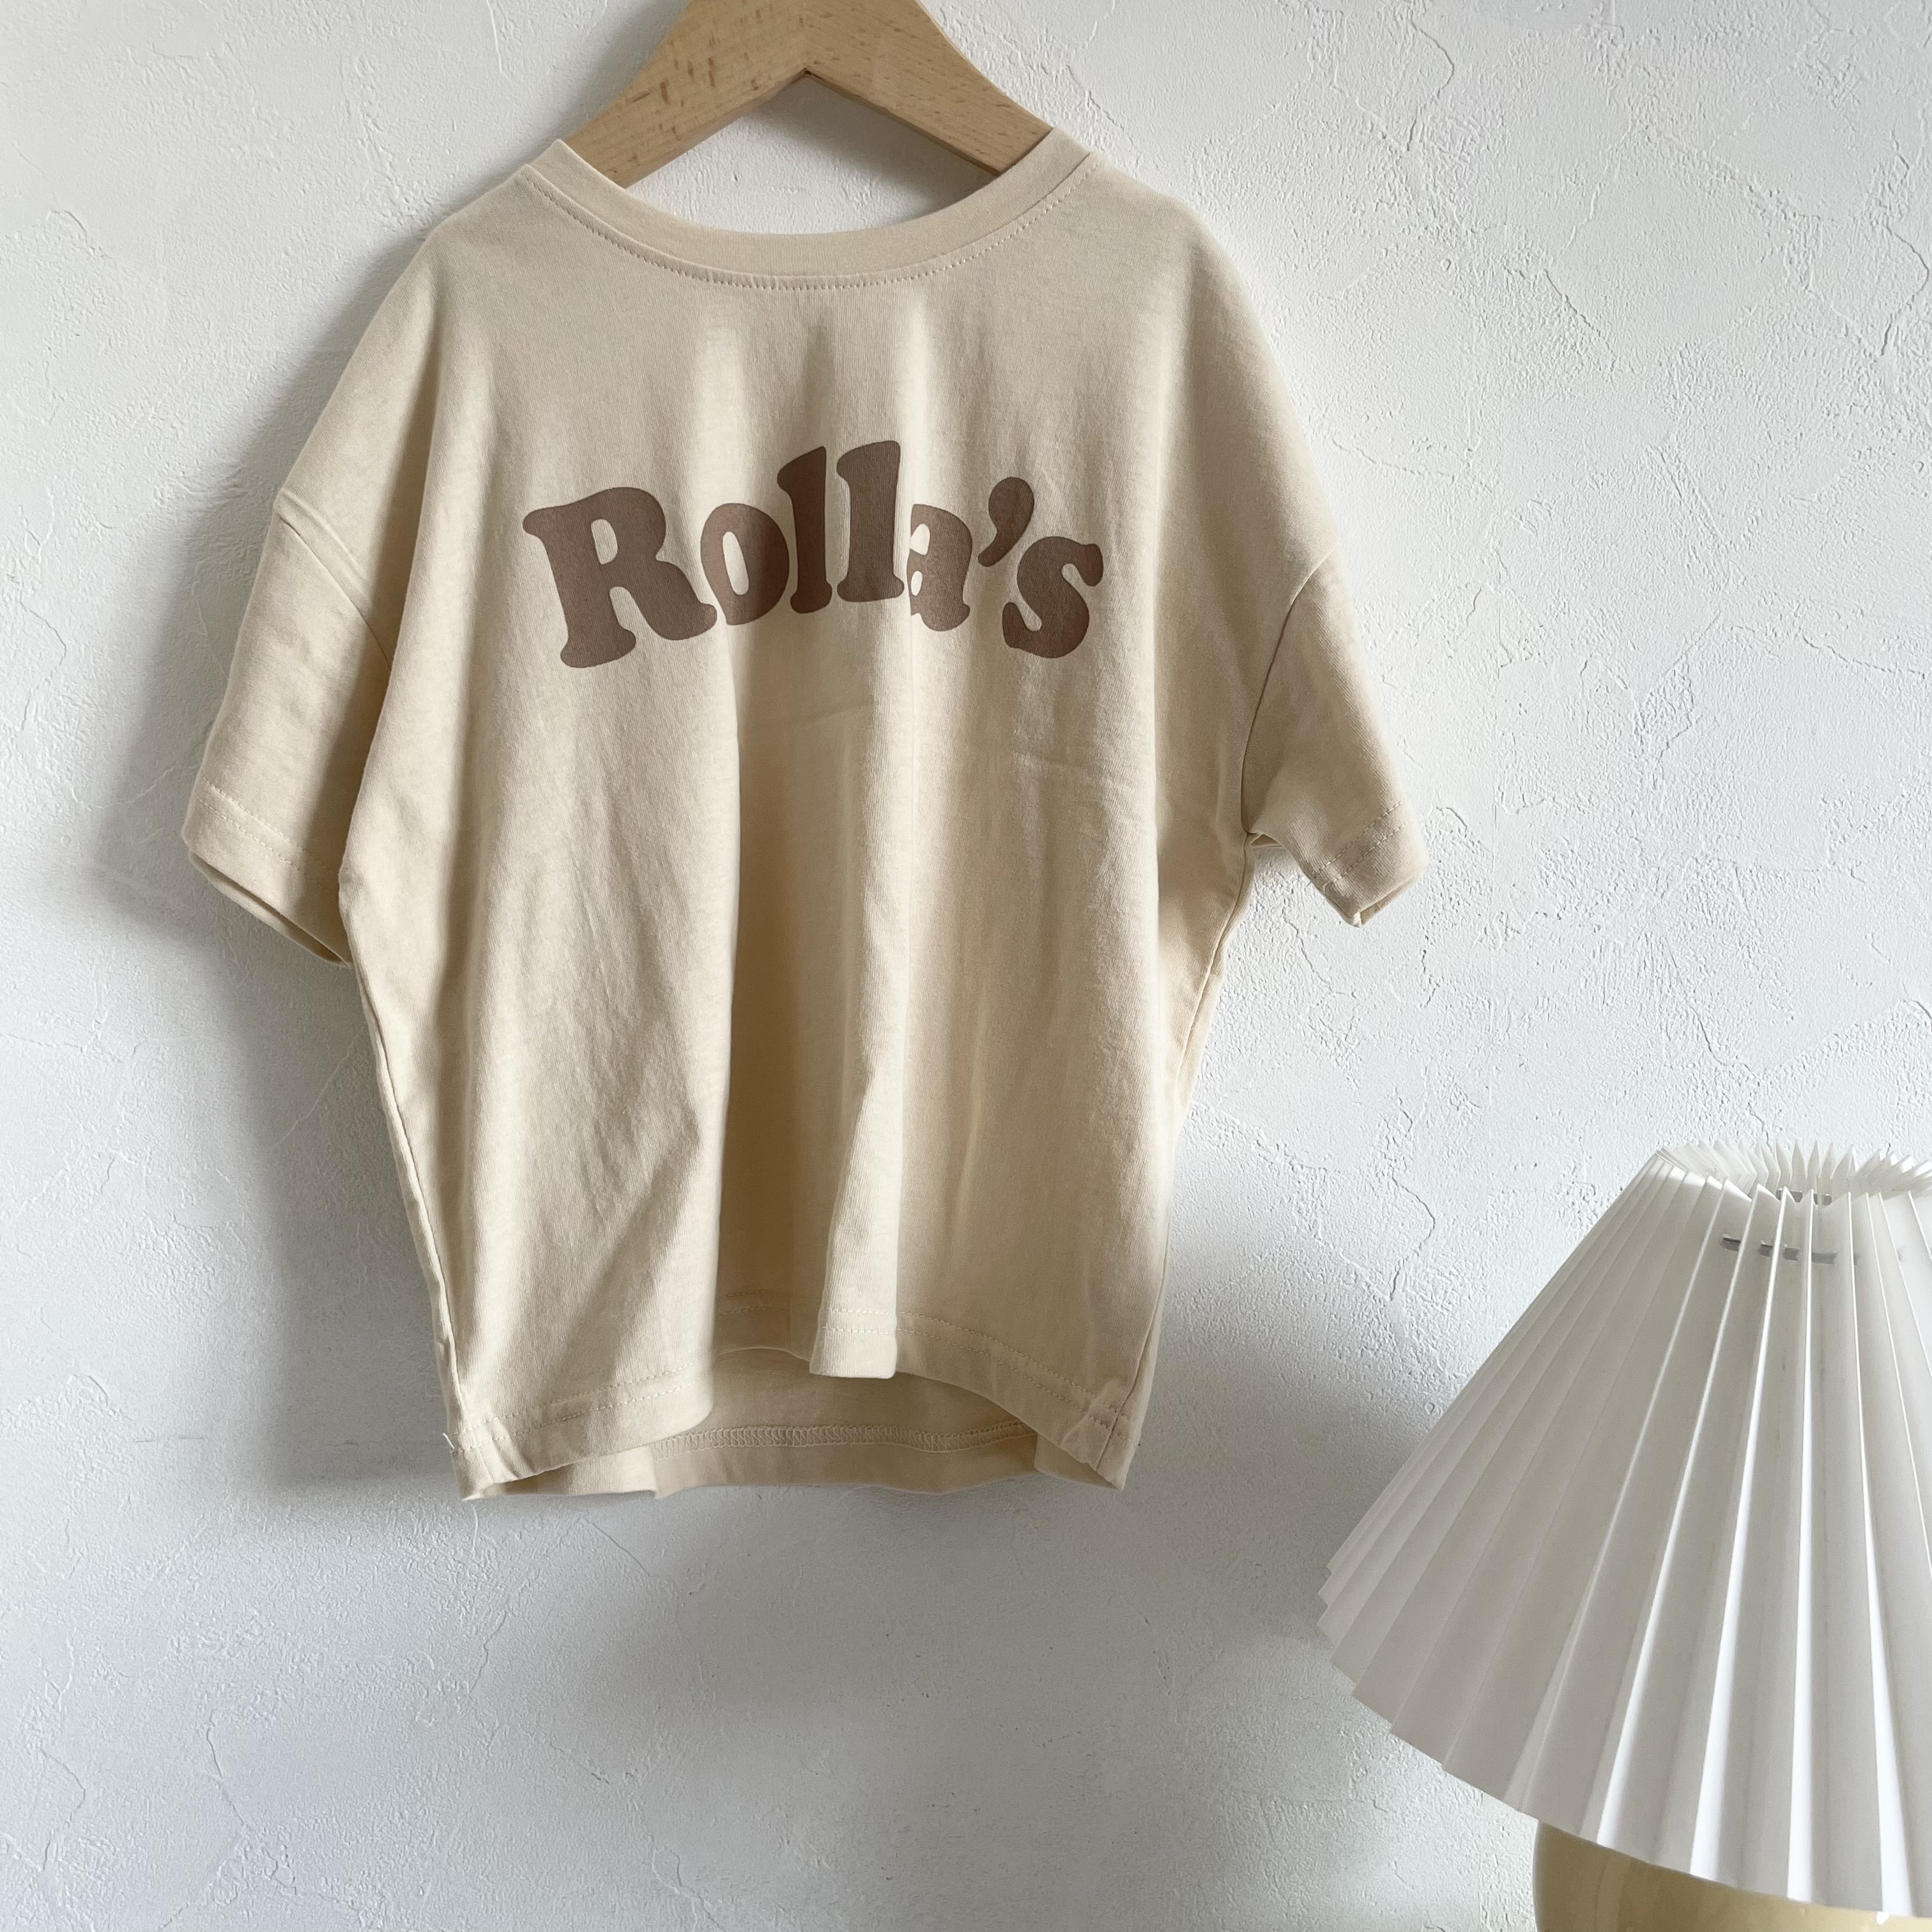 NO.1411. Rolla's tee / white boy